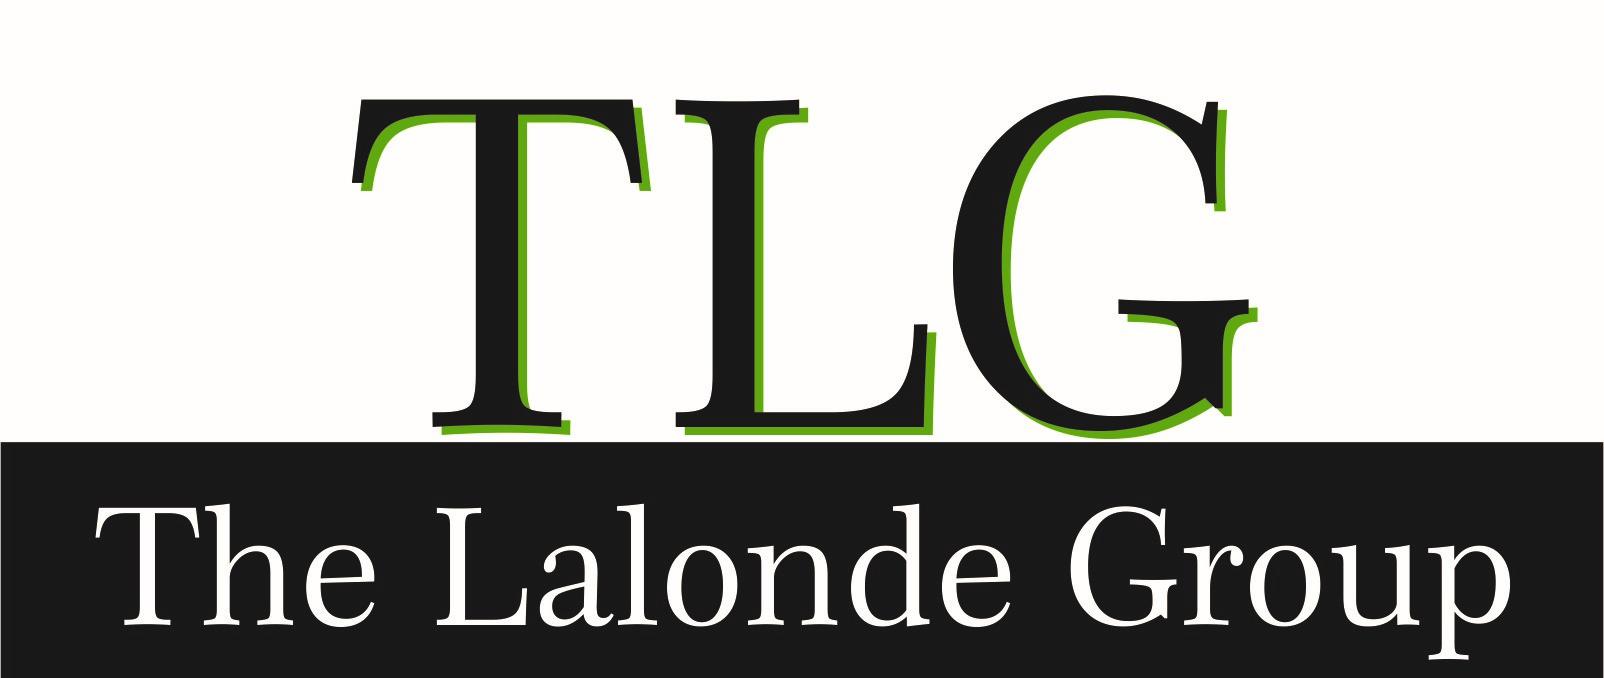 NEW LOGO the lalonde group wordmark.jpg